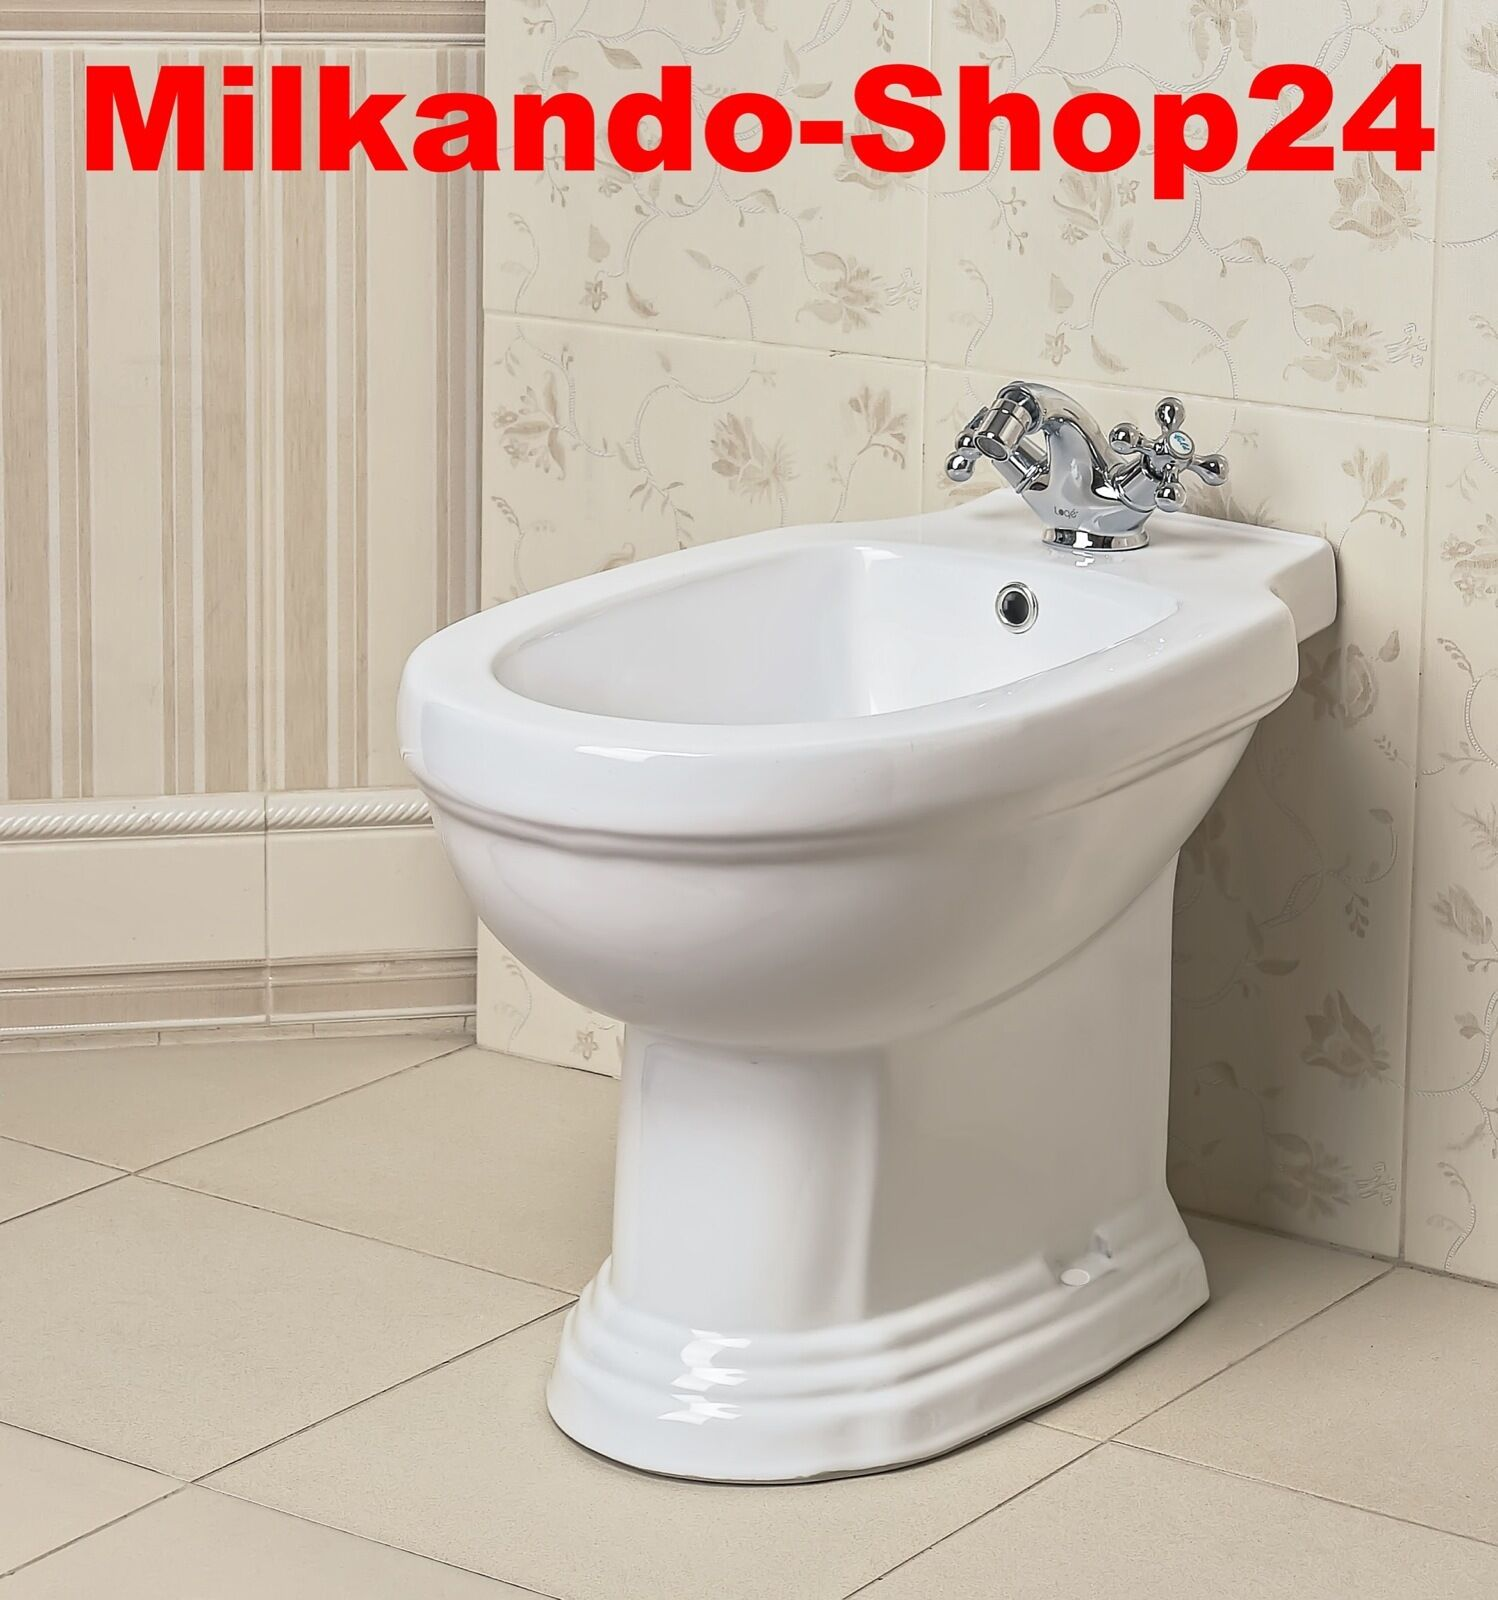 design luxus stand bidet keramik standbidet bidet wc retro classic kr13 kr11 ebay. Black Bedroom Furniture Sets. Home Design Ideas